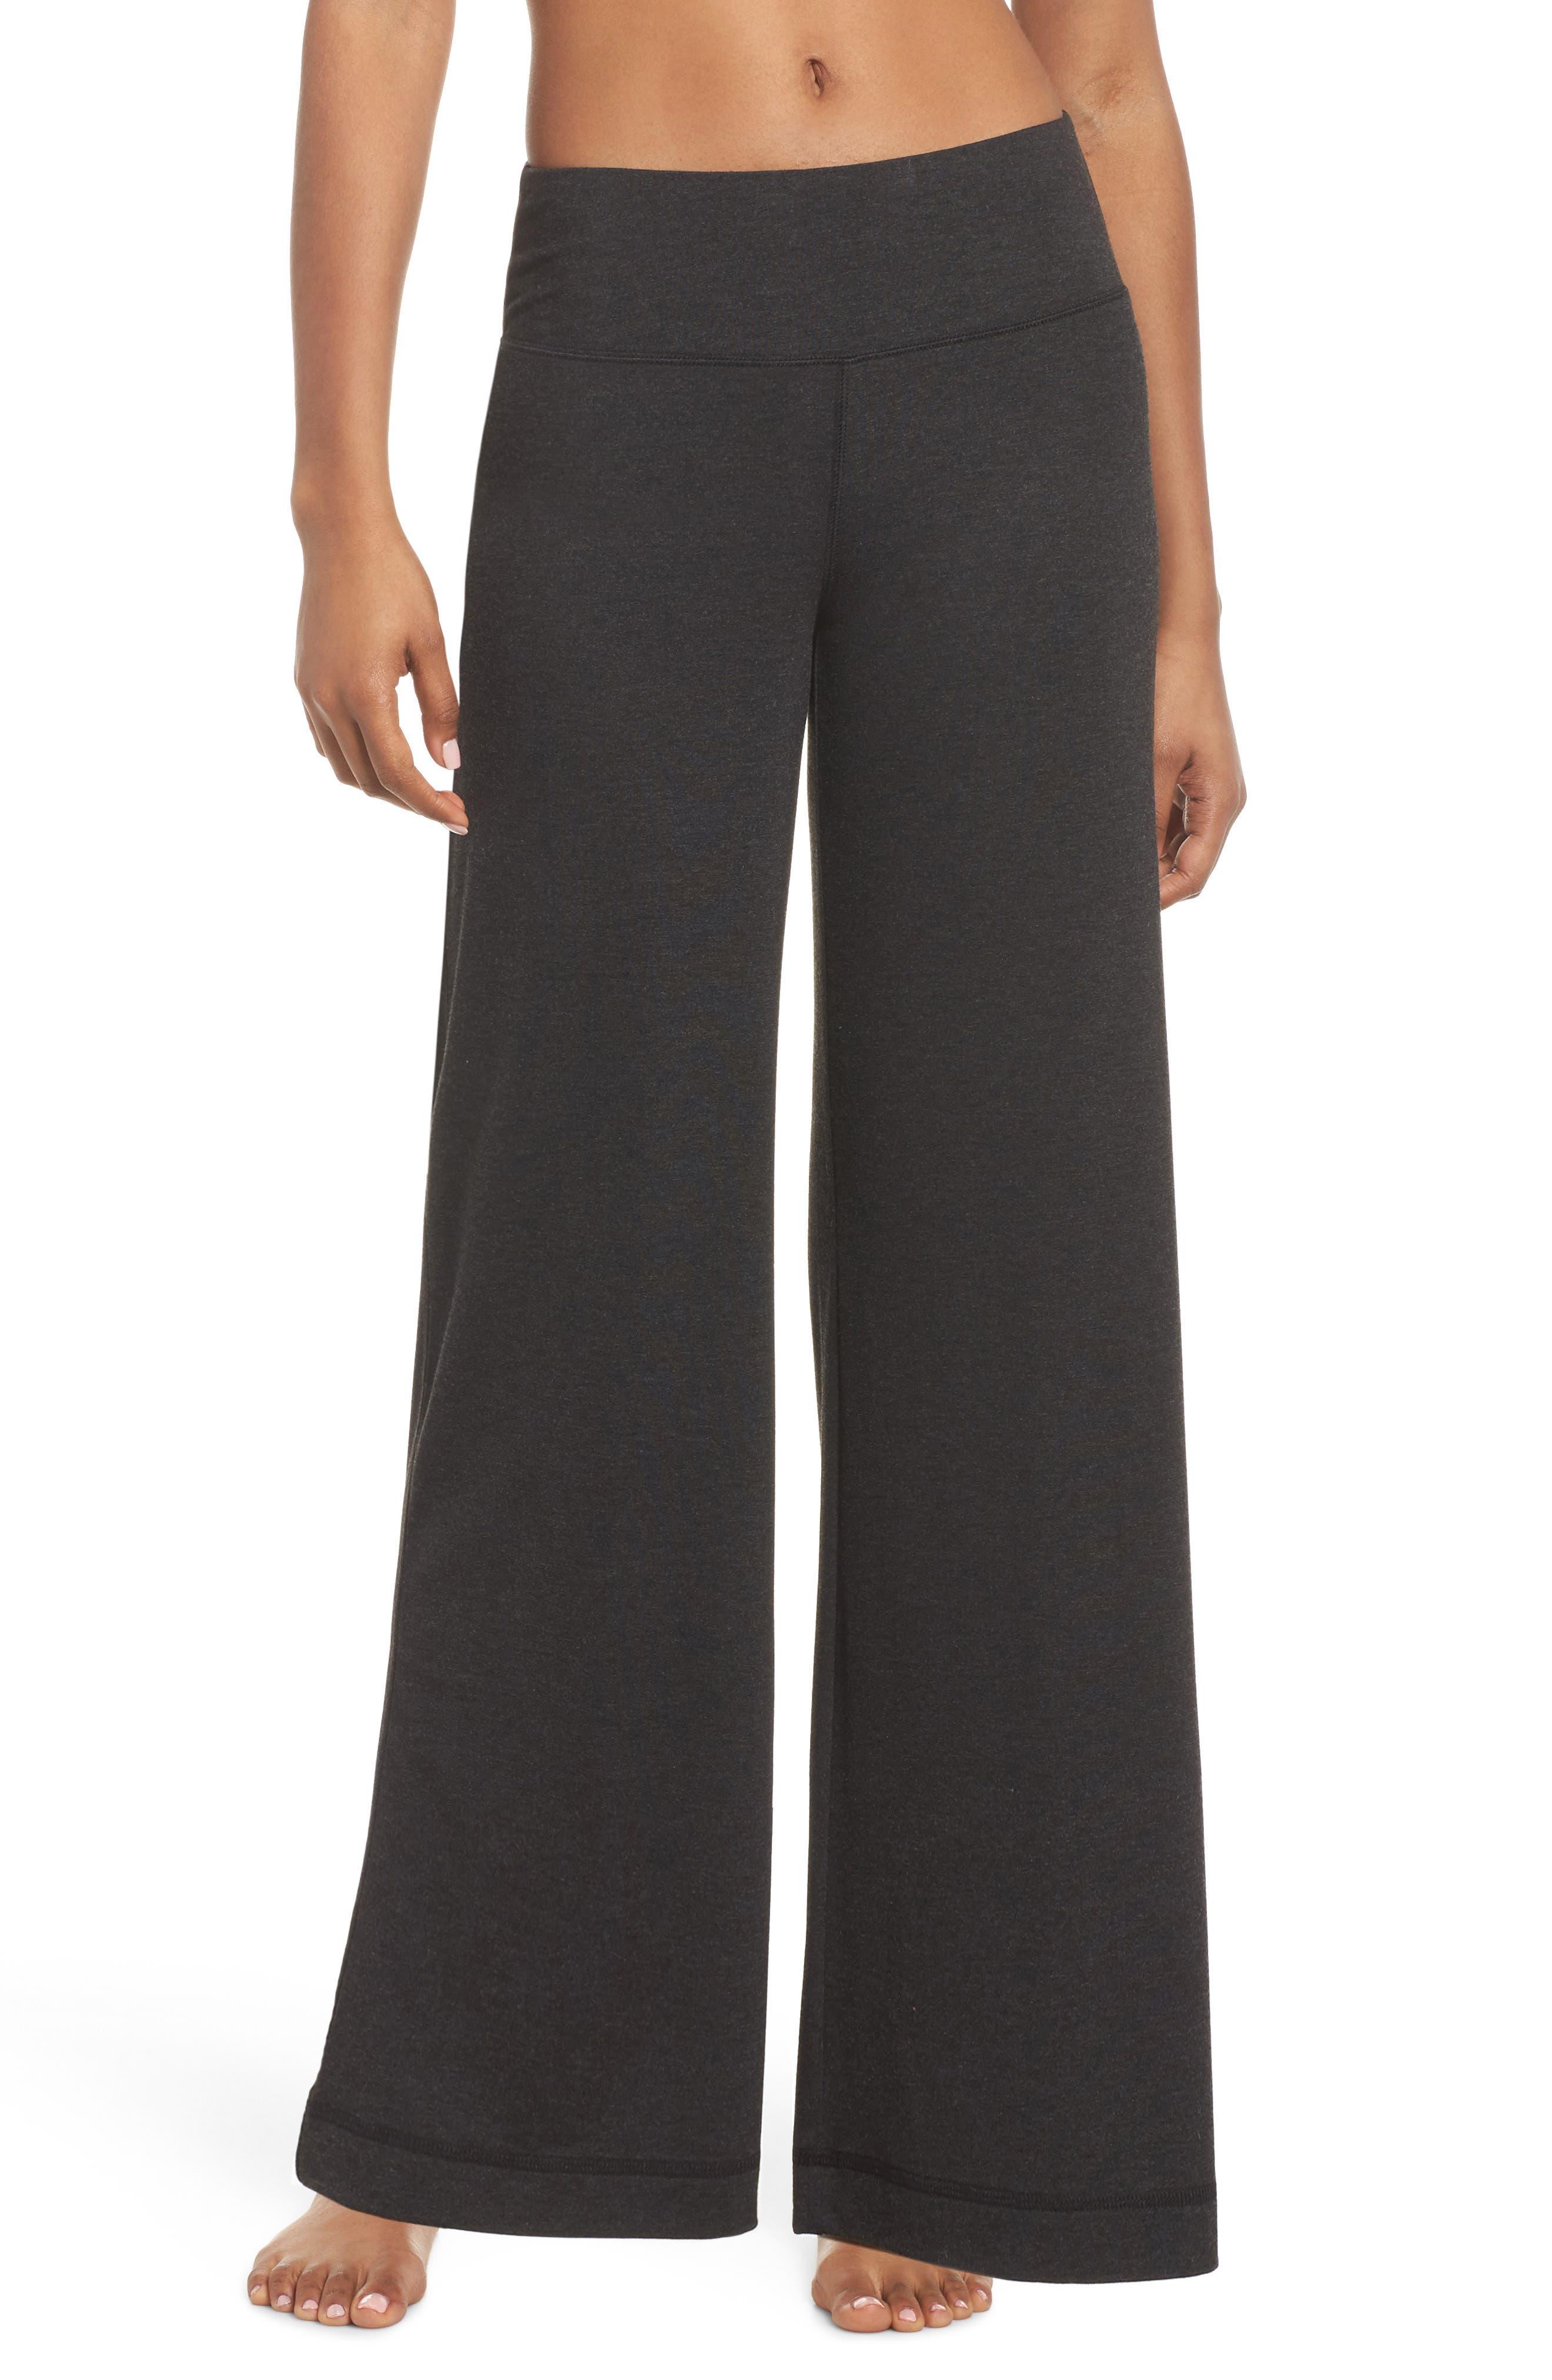 Zella Go With The Flow Pants